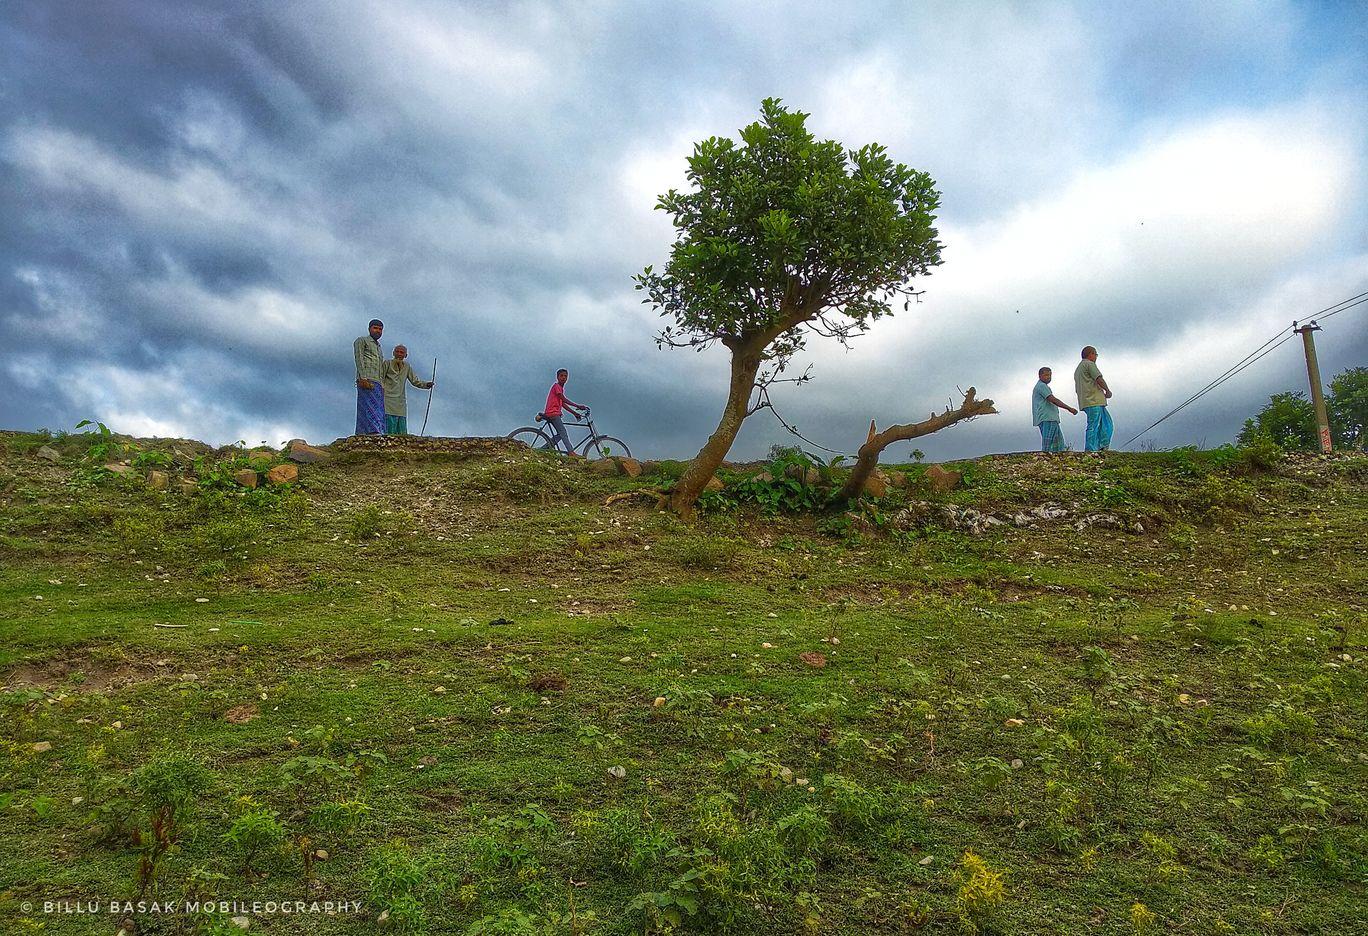 Photo of Dhubri By Billu Basak